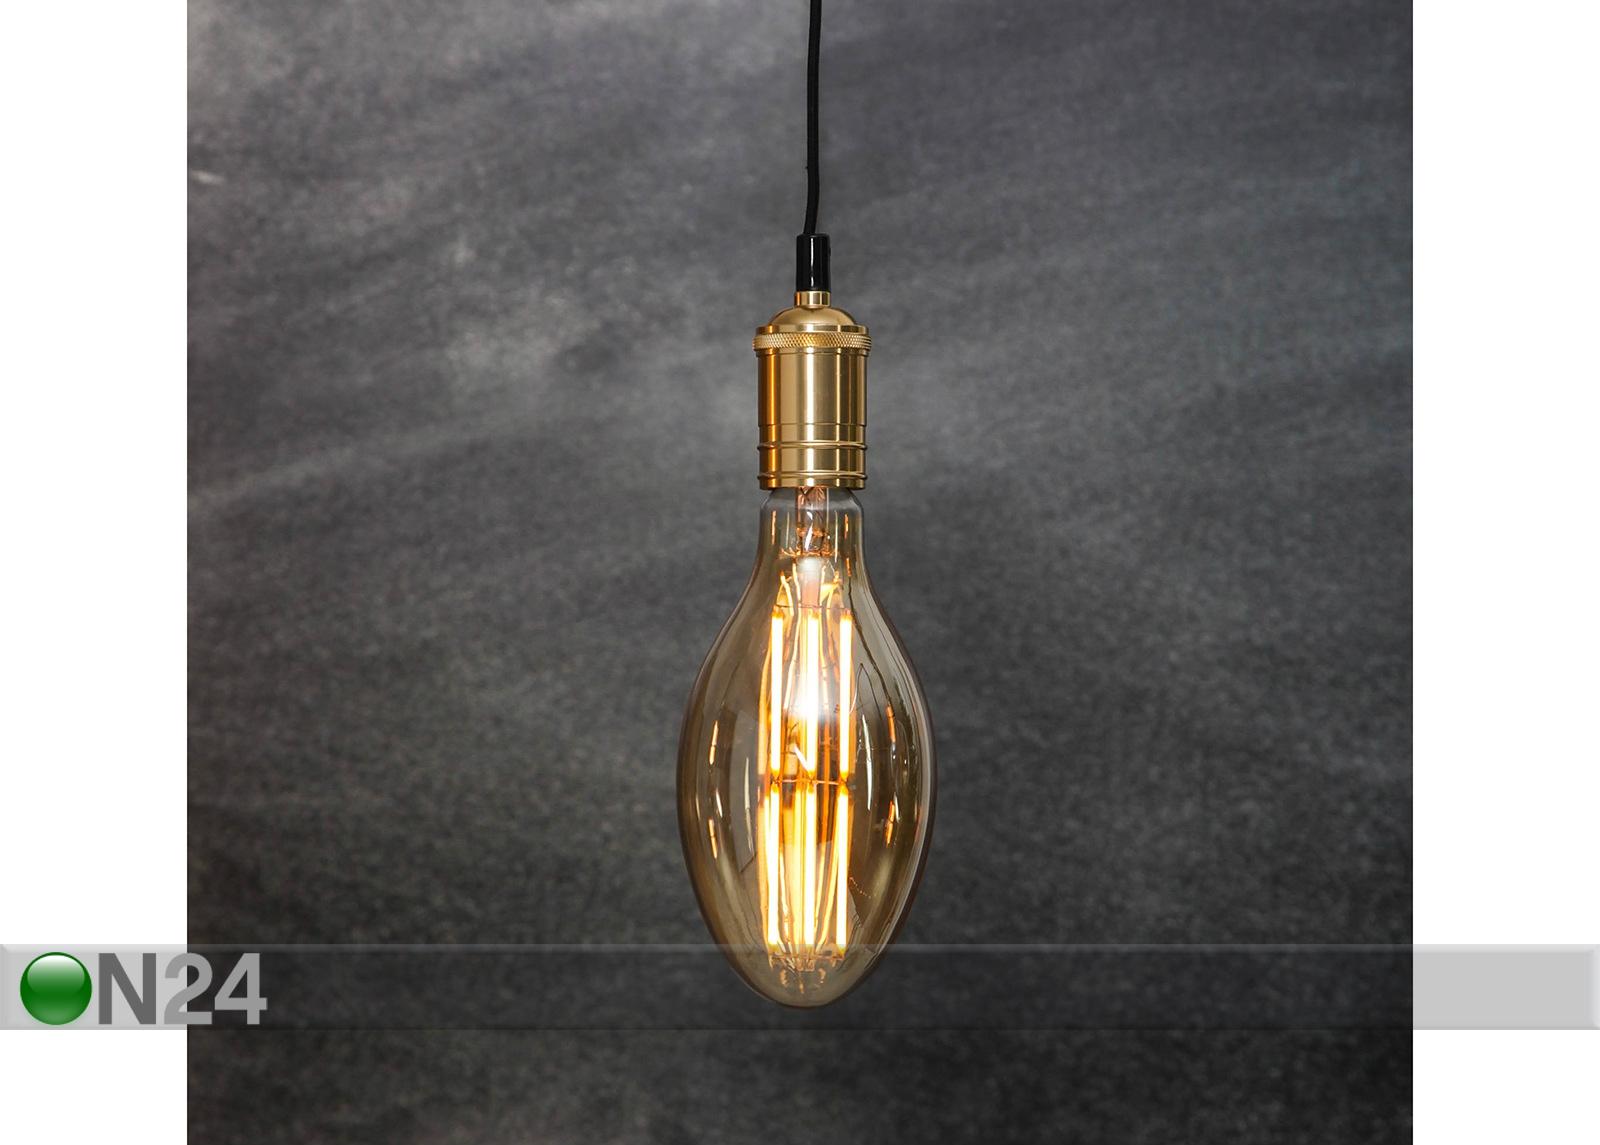 0bd919e119f Dekoratiivne LED pirn E27 6,5 W AA-152415 - ON24 Sisustuskaubamaja